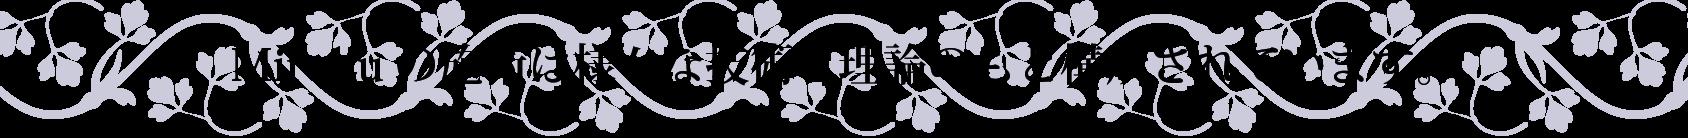 Mirokuの施術は様々な技術と理念のもと構成されています。